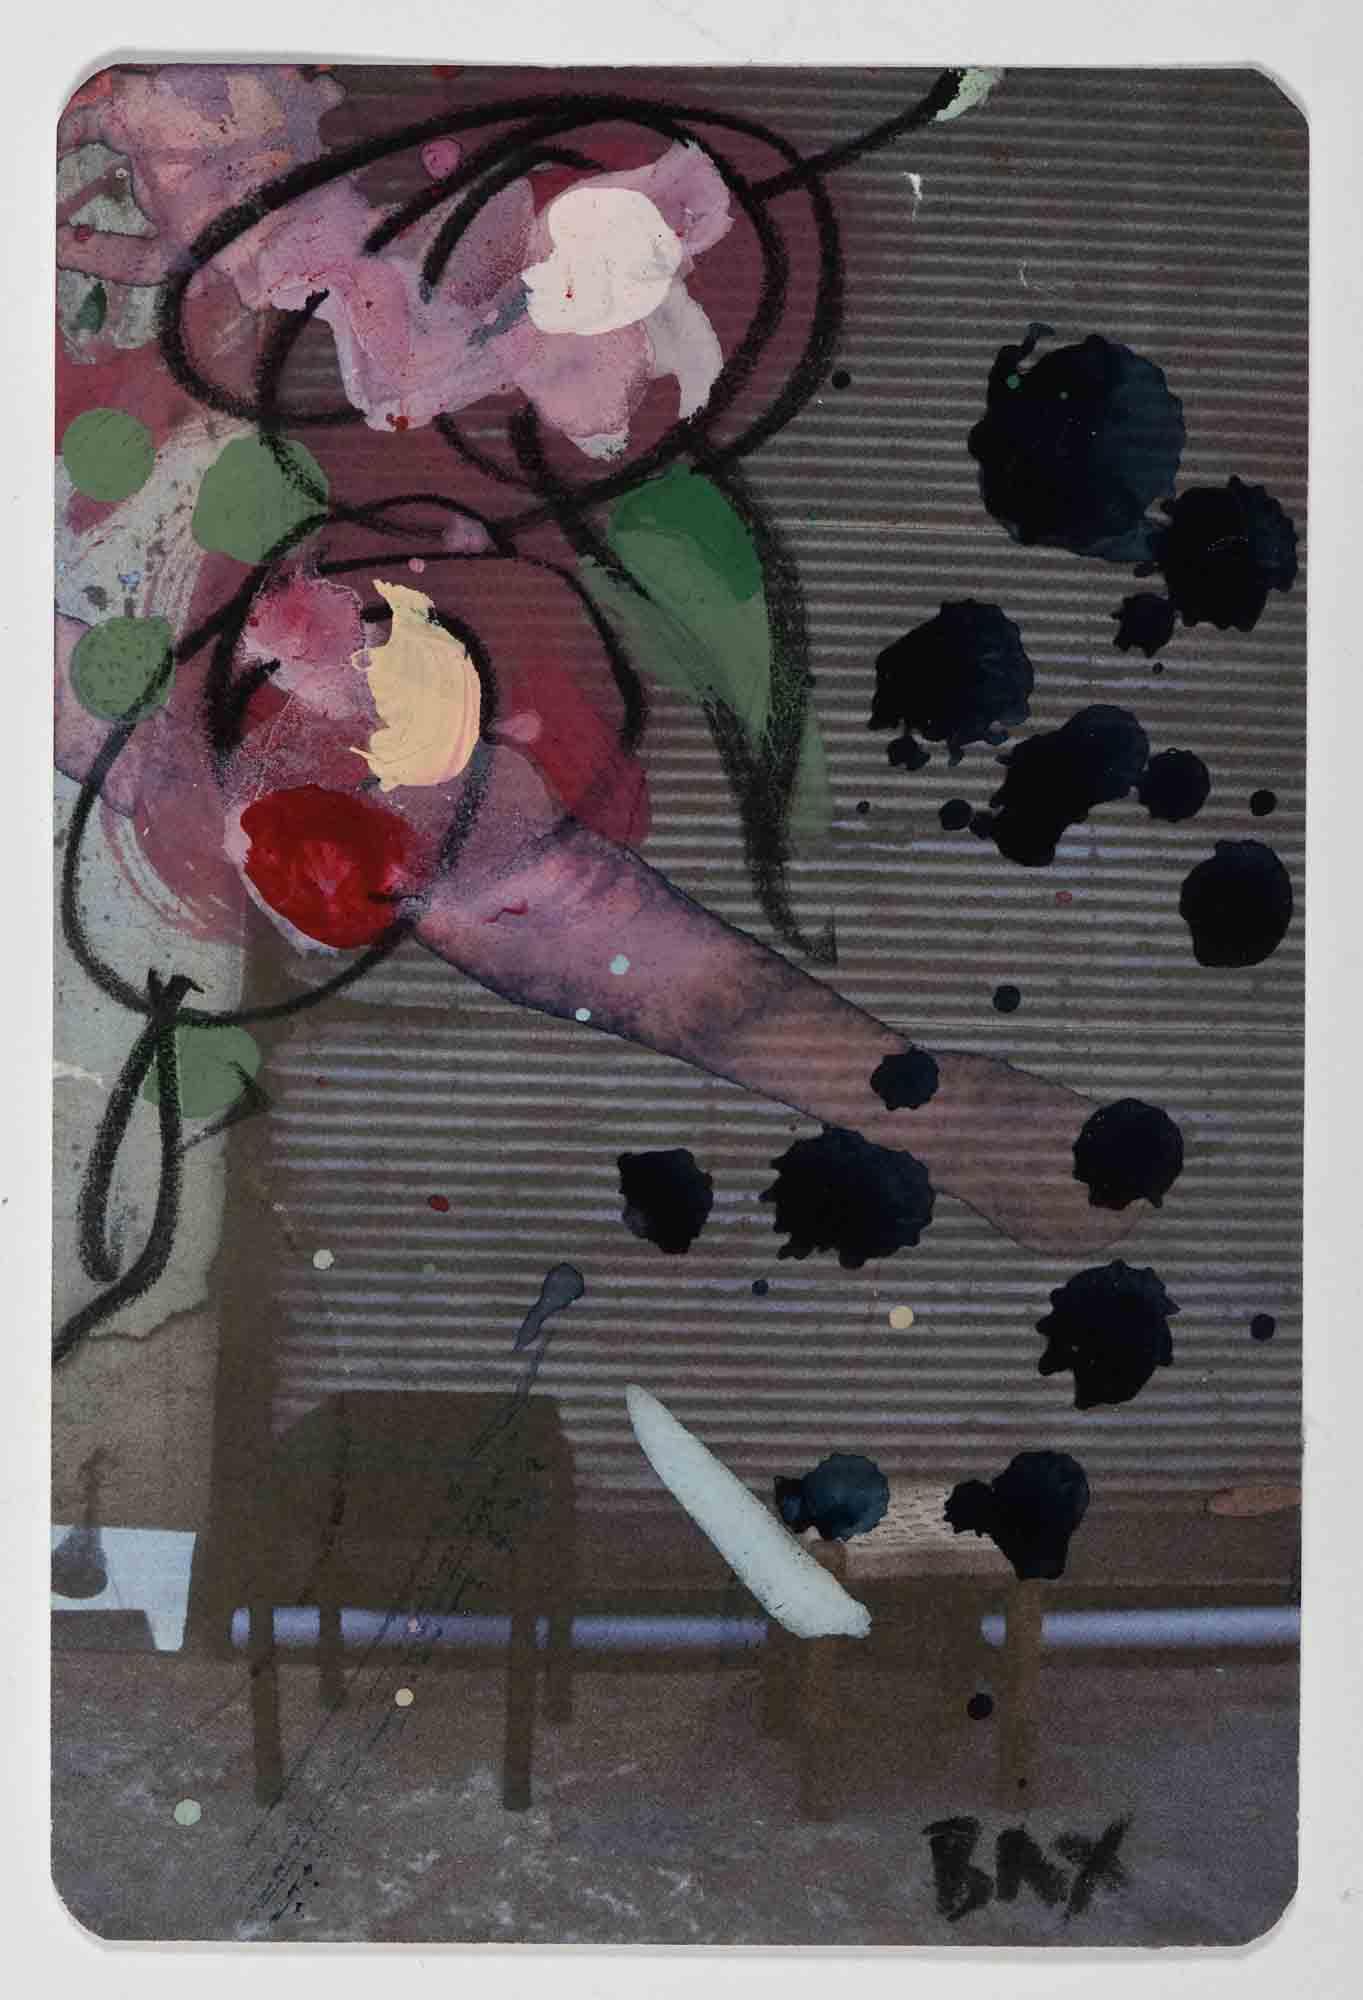 Matthew Bax,  Sample Garden Romance 1 , 2012, acrylic, charcoal, pencil, wax crayon on paper, 15 x 10cm